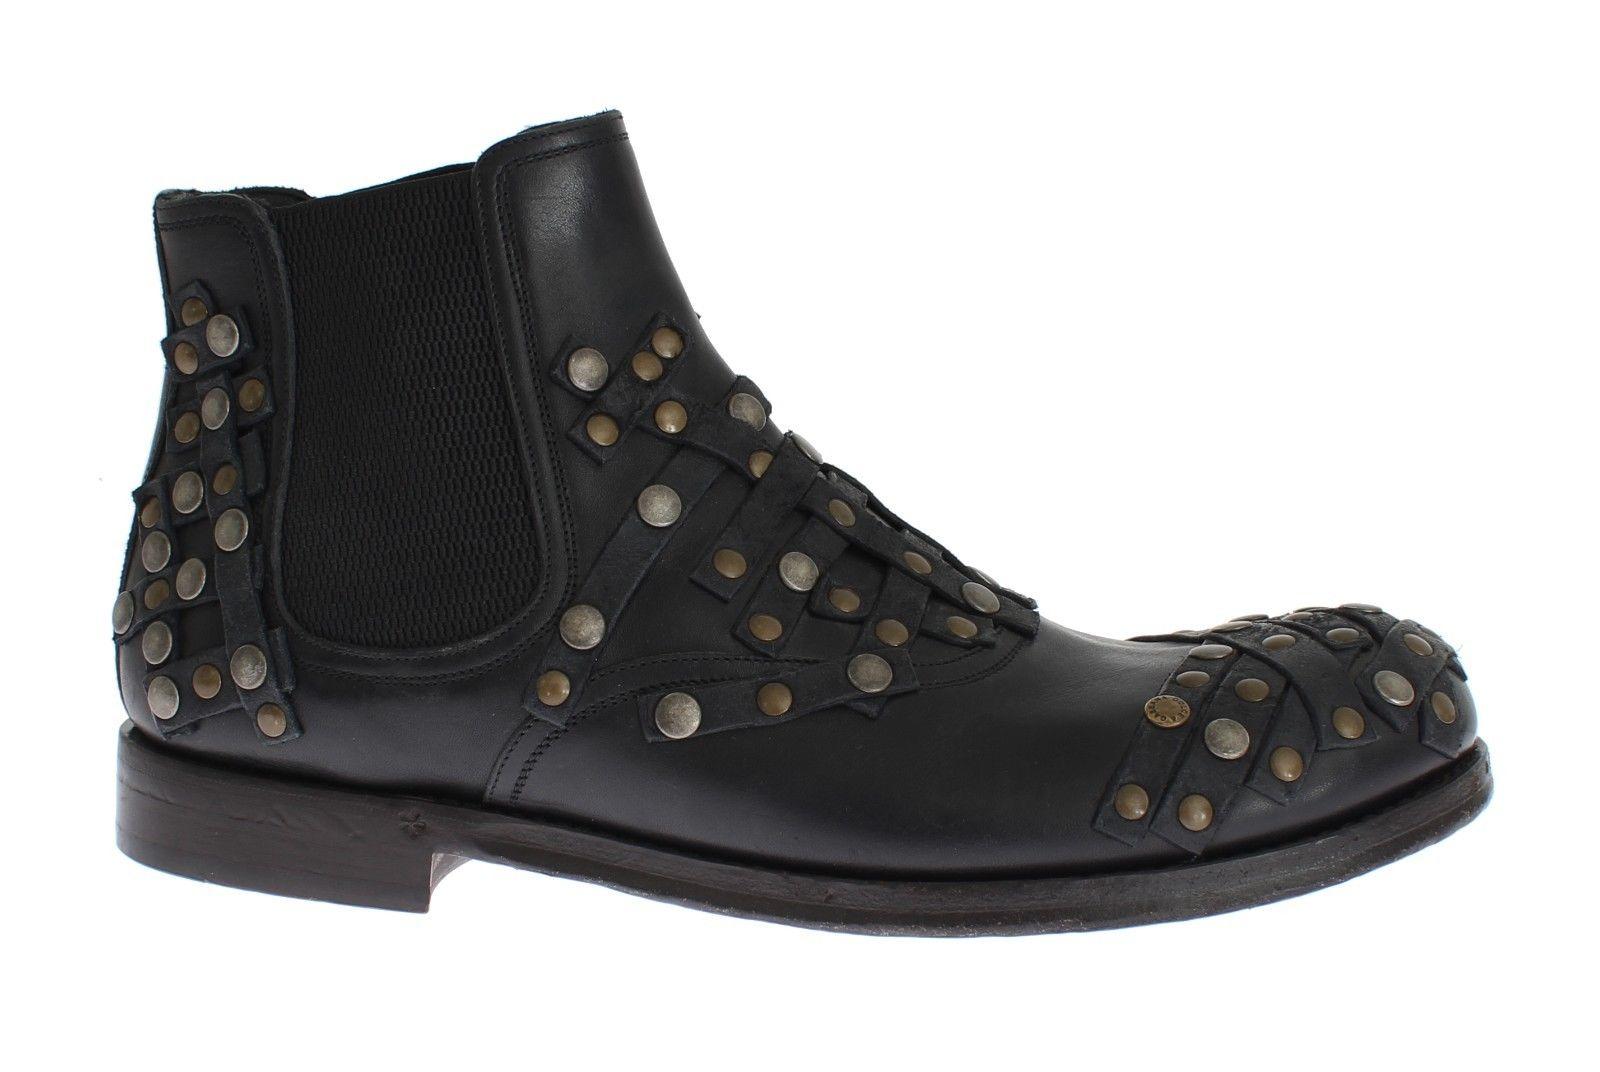 Dolce & Gabbana Men's Leather Studded Boots Black MOM25588 - EU40/US7